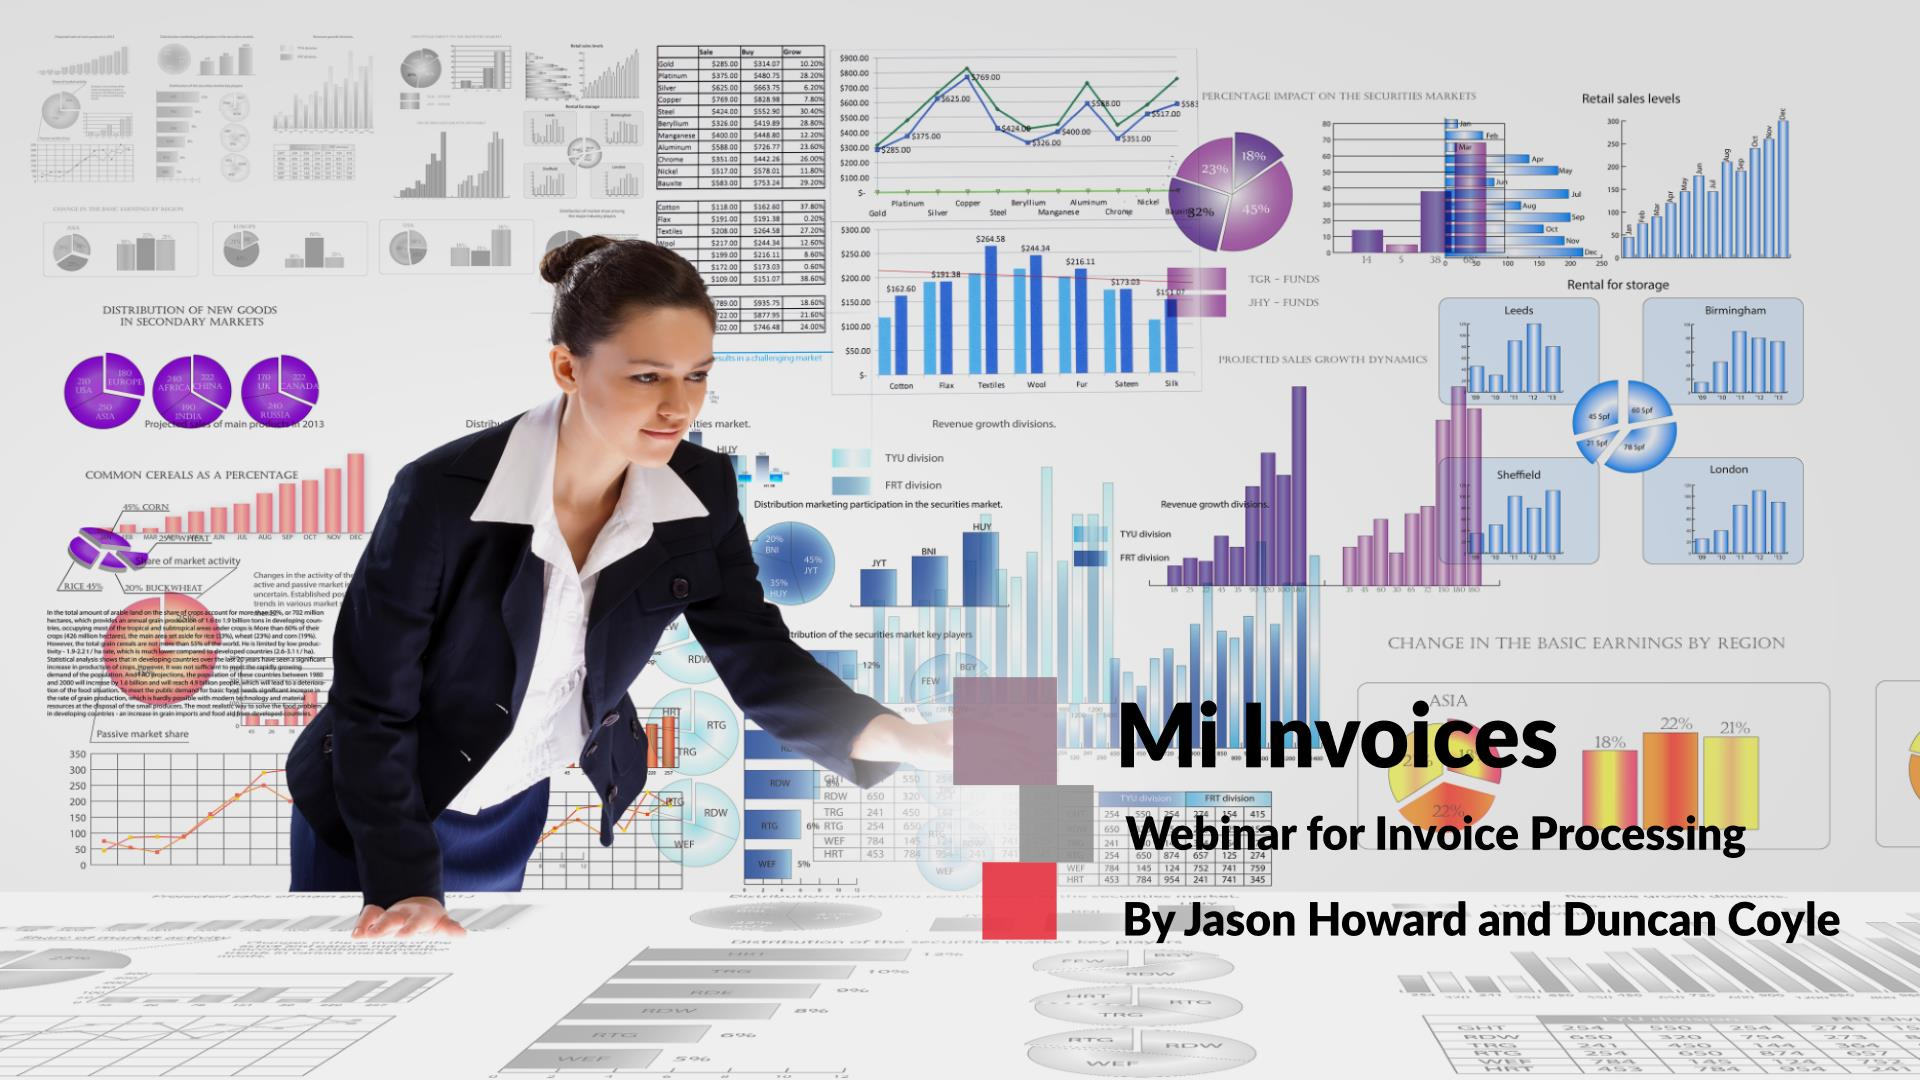 Mi Invoices Webinar 150621_1